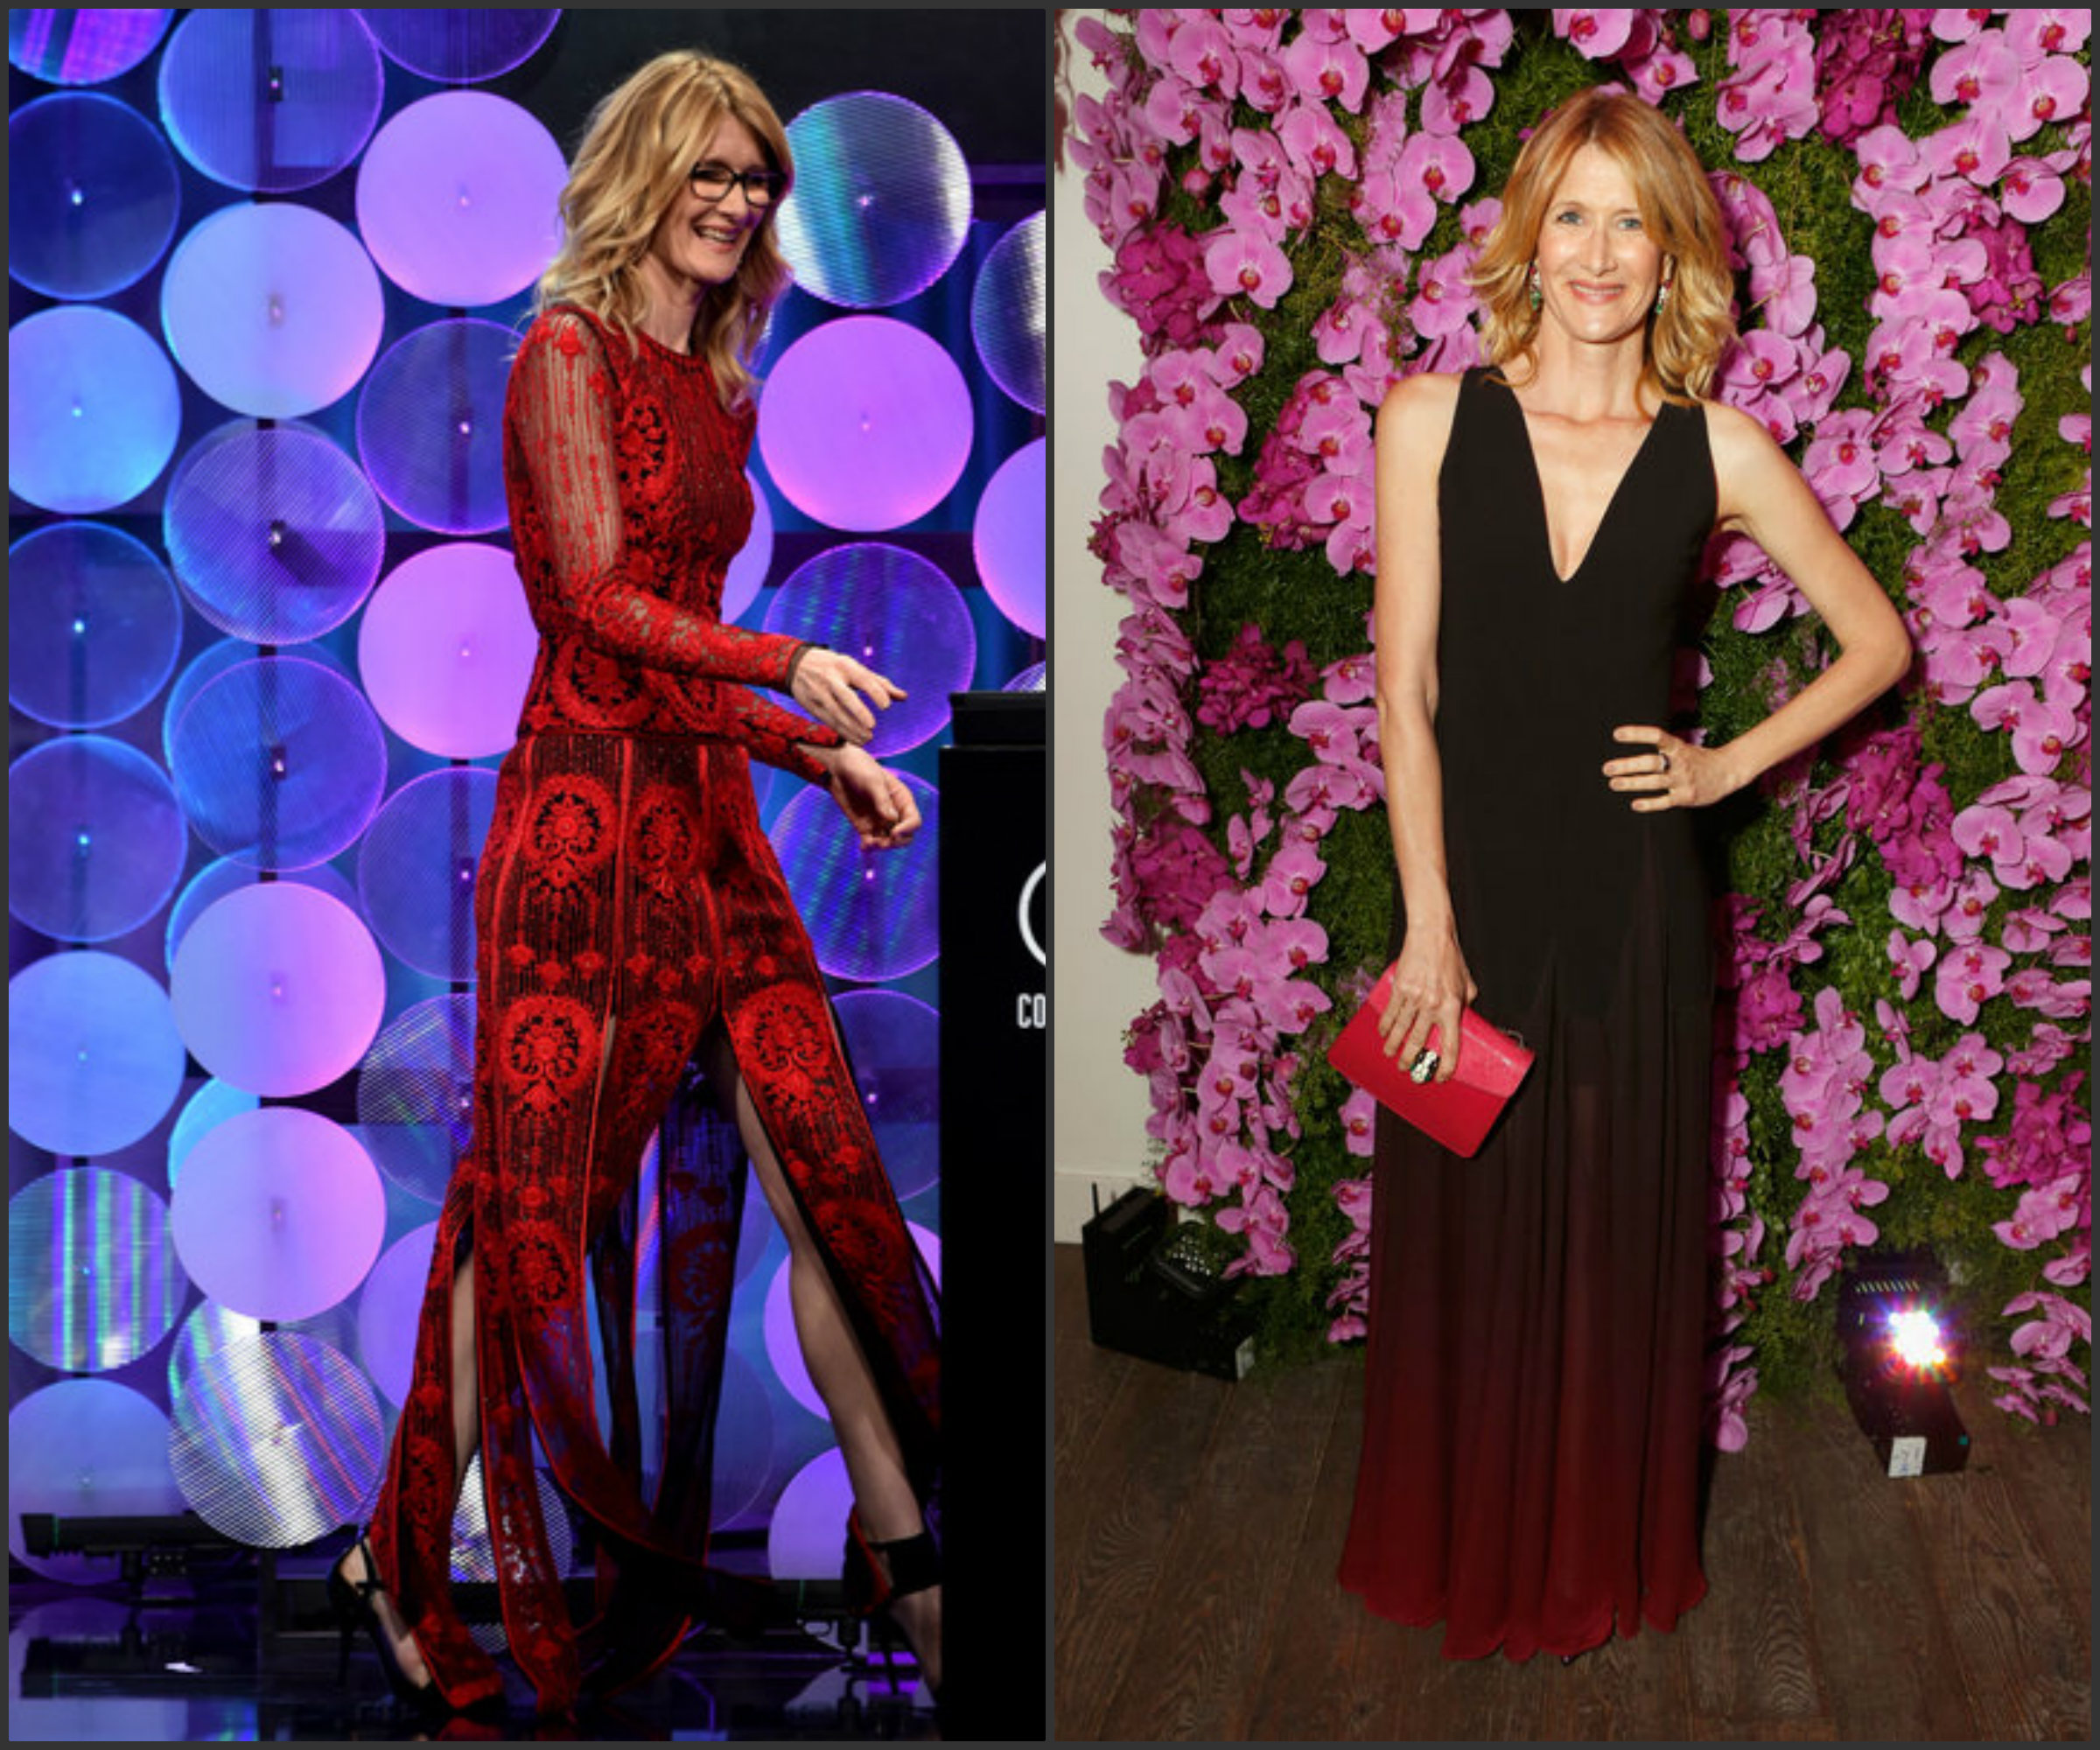 Laura-Dern-In-Naeem-Khan-Halston-Heritage-17th-Costume-Designers-Guild-Awards-BVLGARI-Pre-Oscar-Event